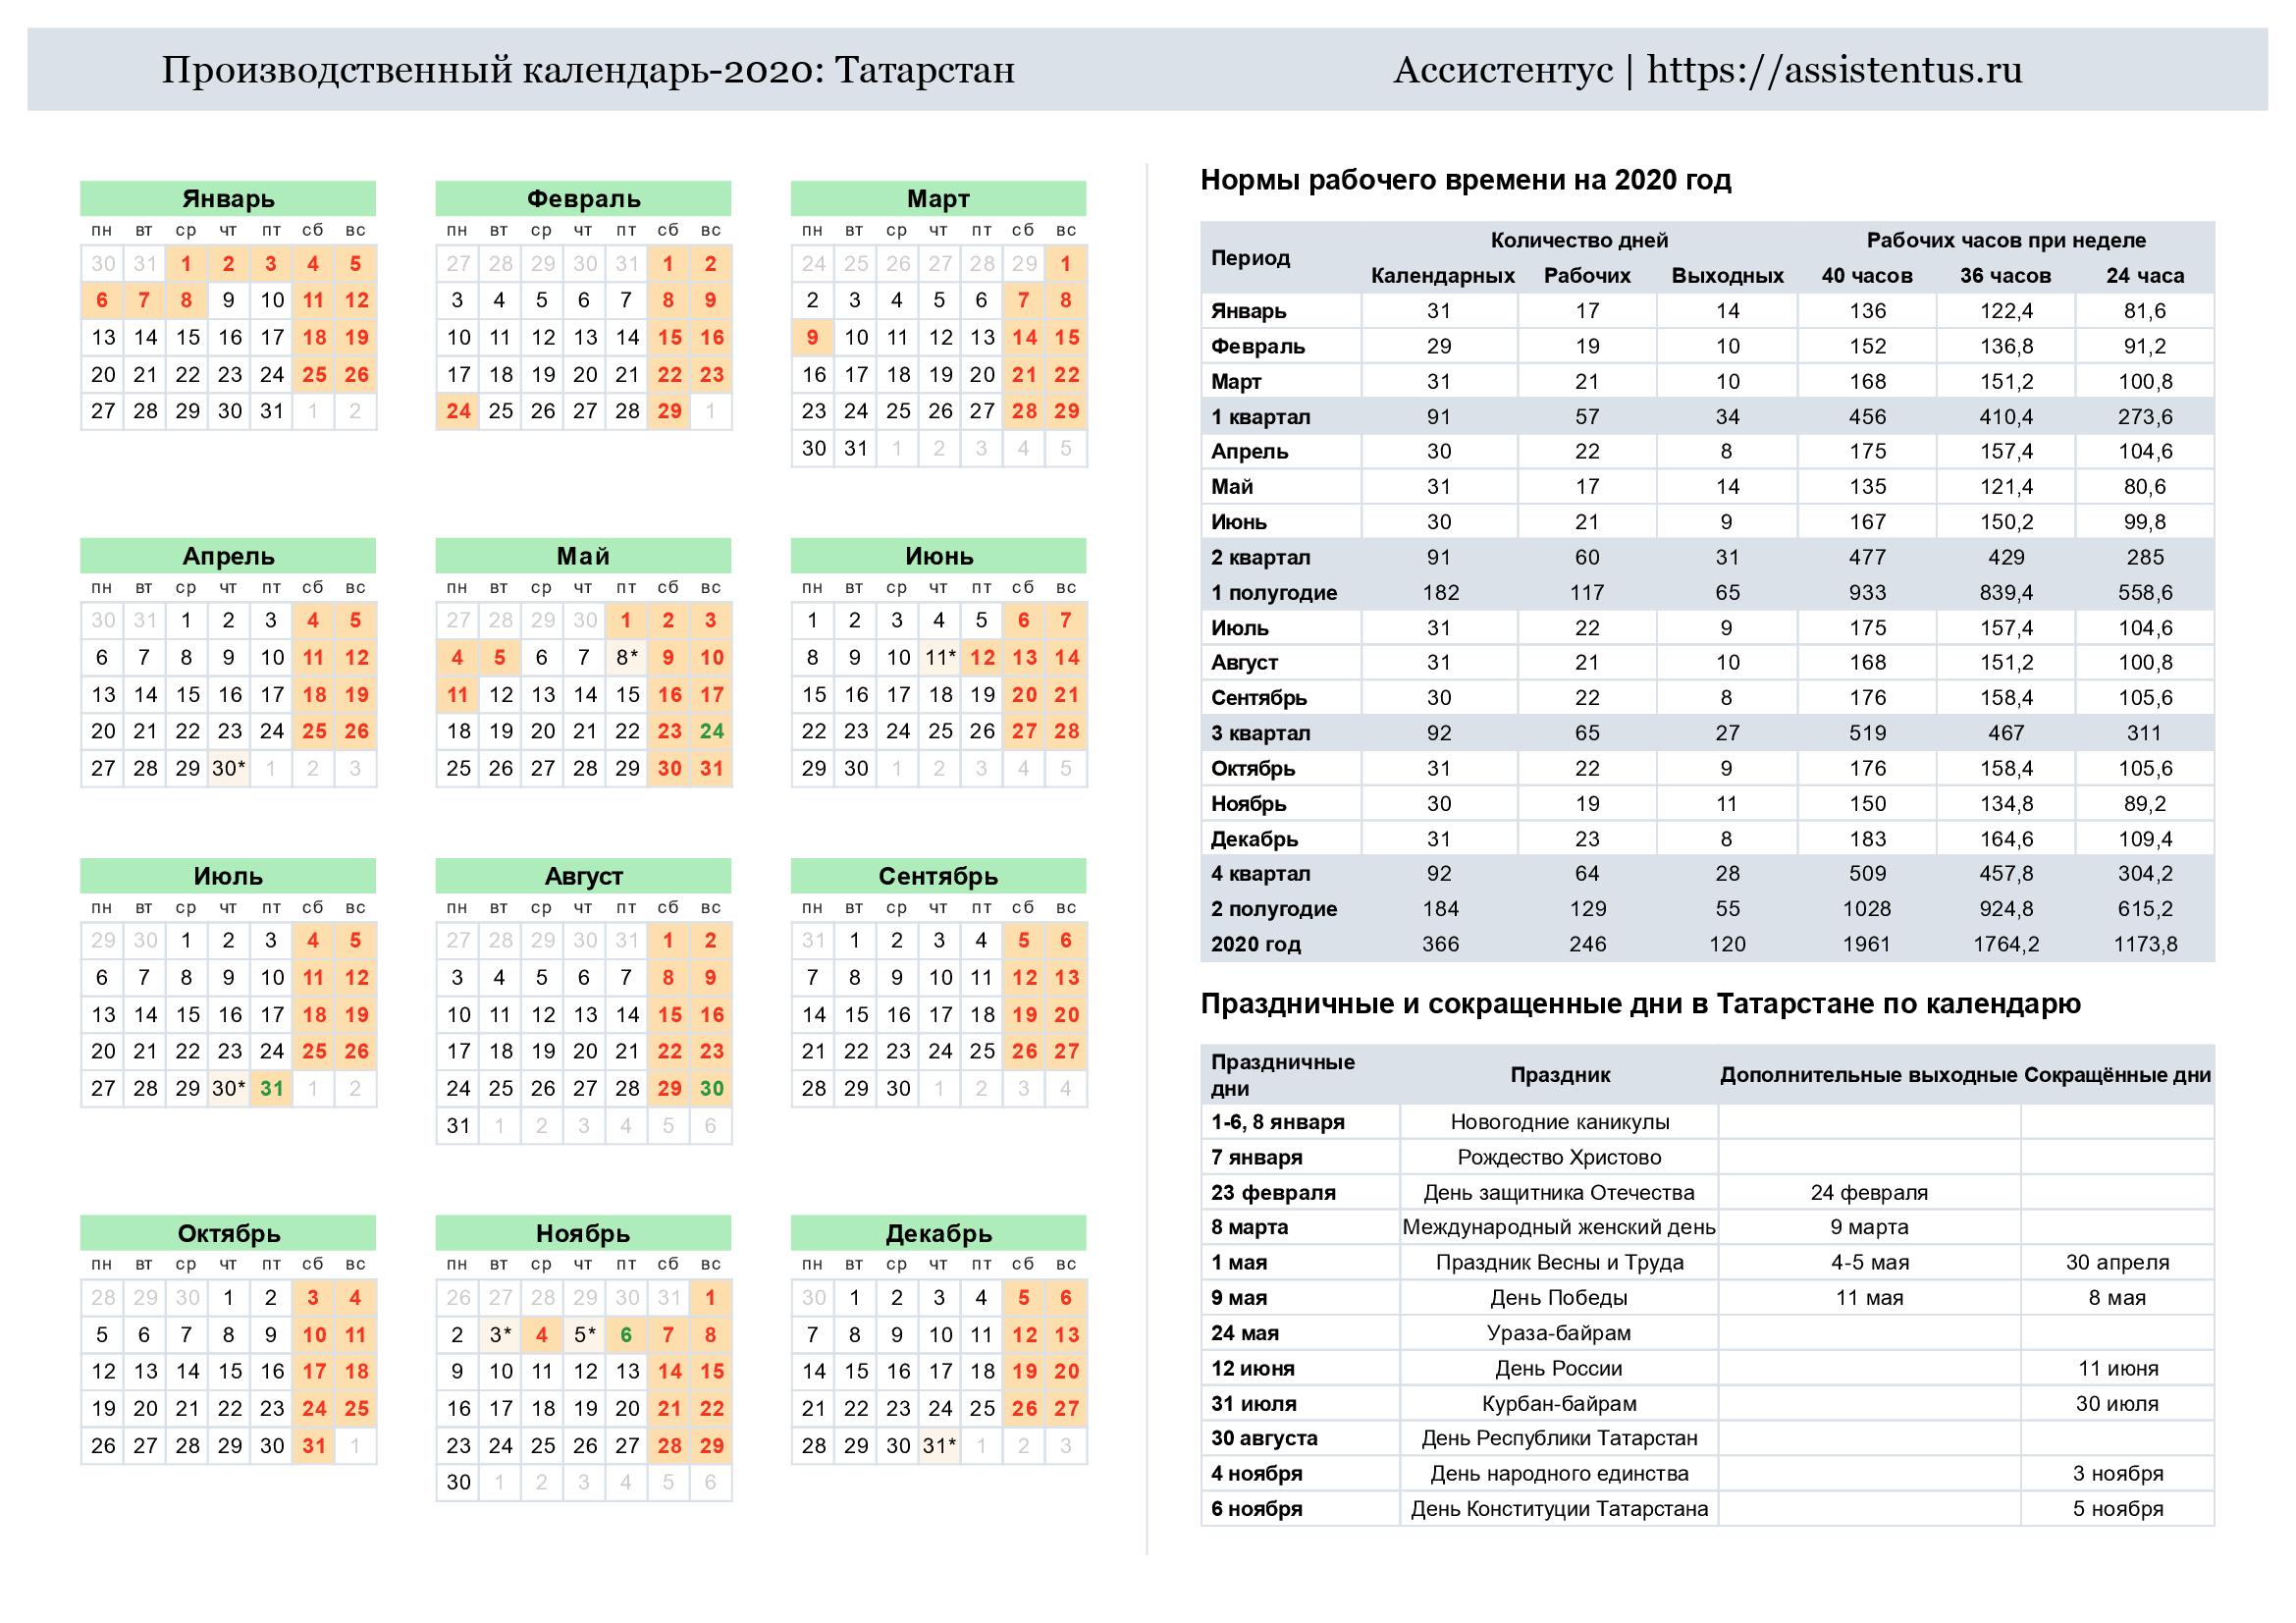 Производственный календарь 2020, Татарстан